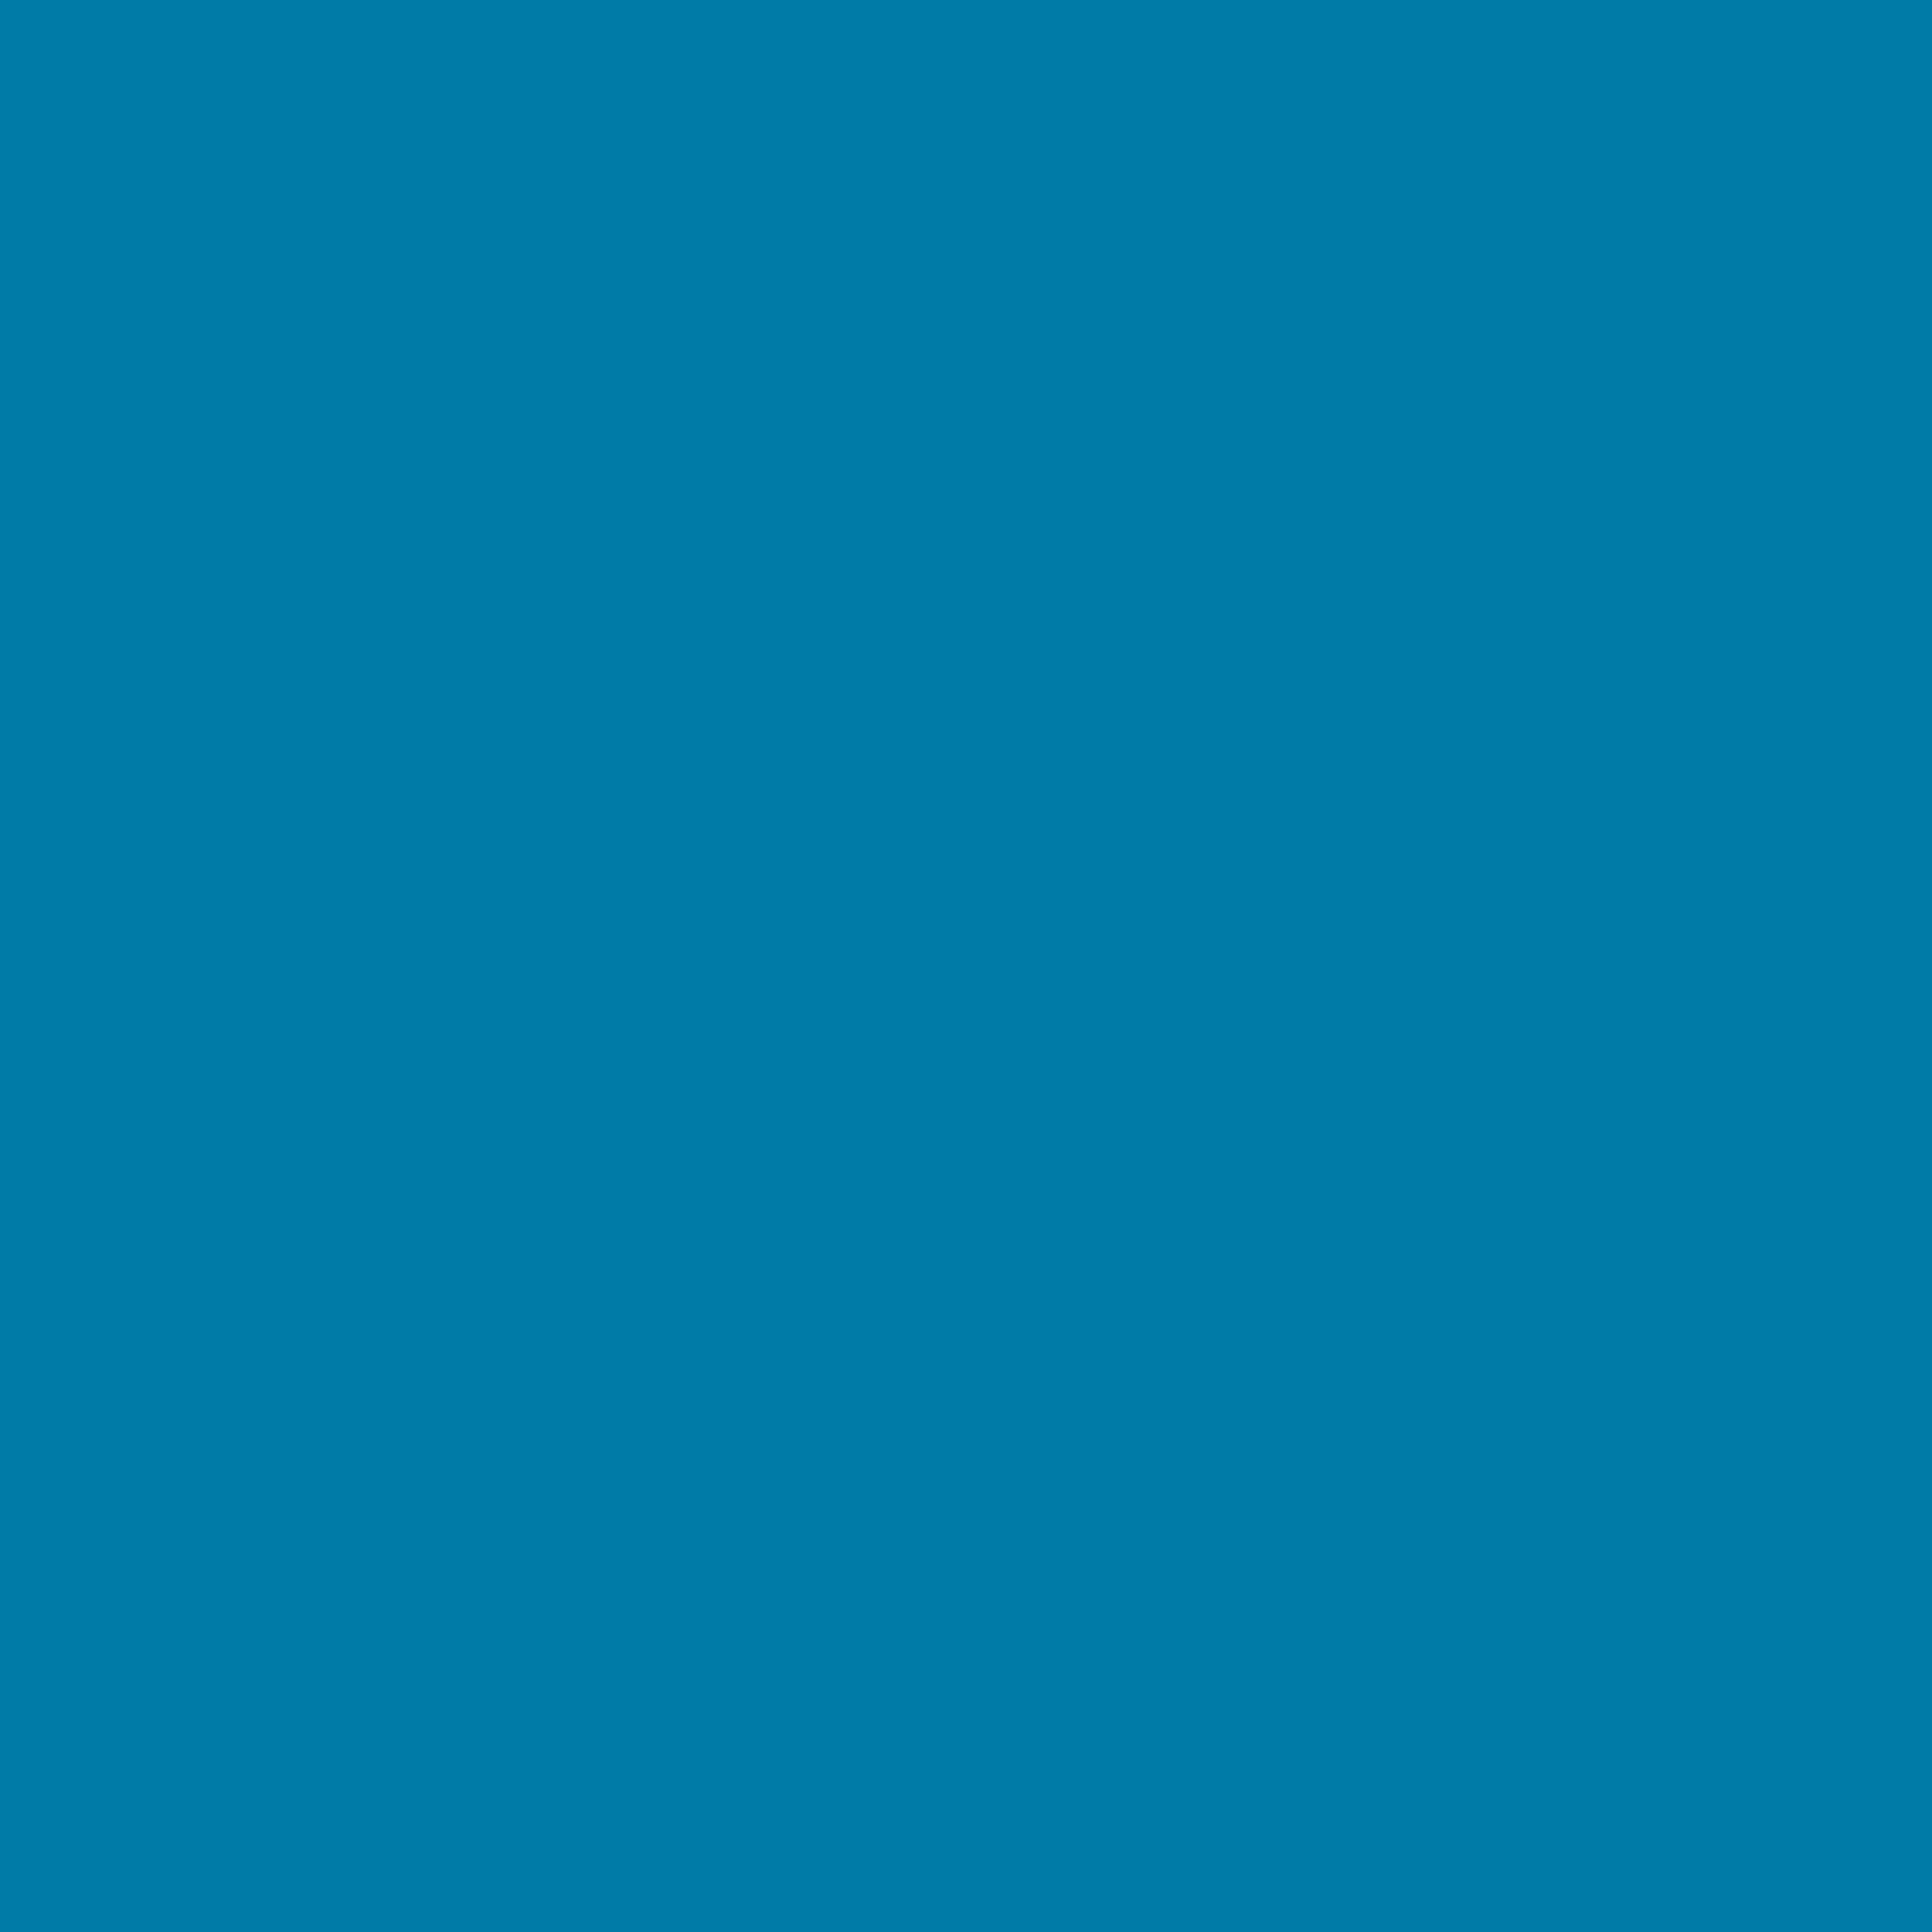 3600x3600 Celadon Blue Solid Color Background